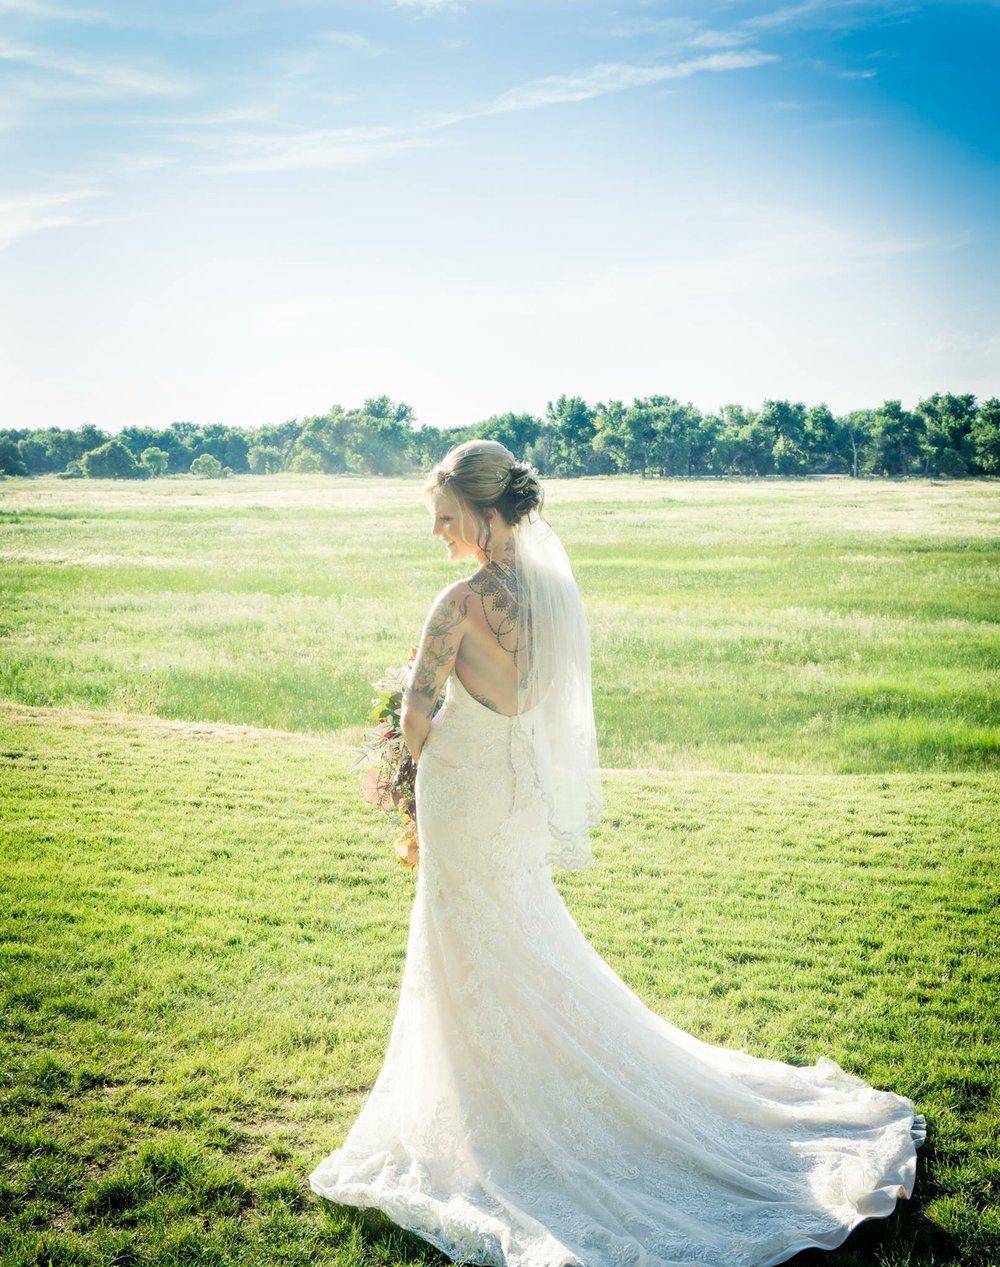 braids-wedding-hairstylist-bridal-hair